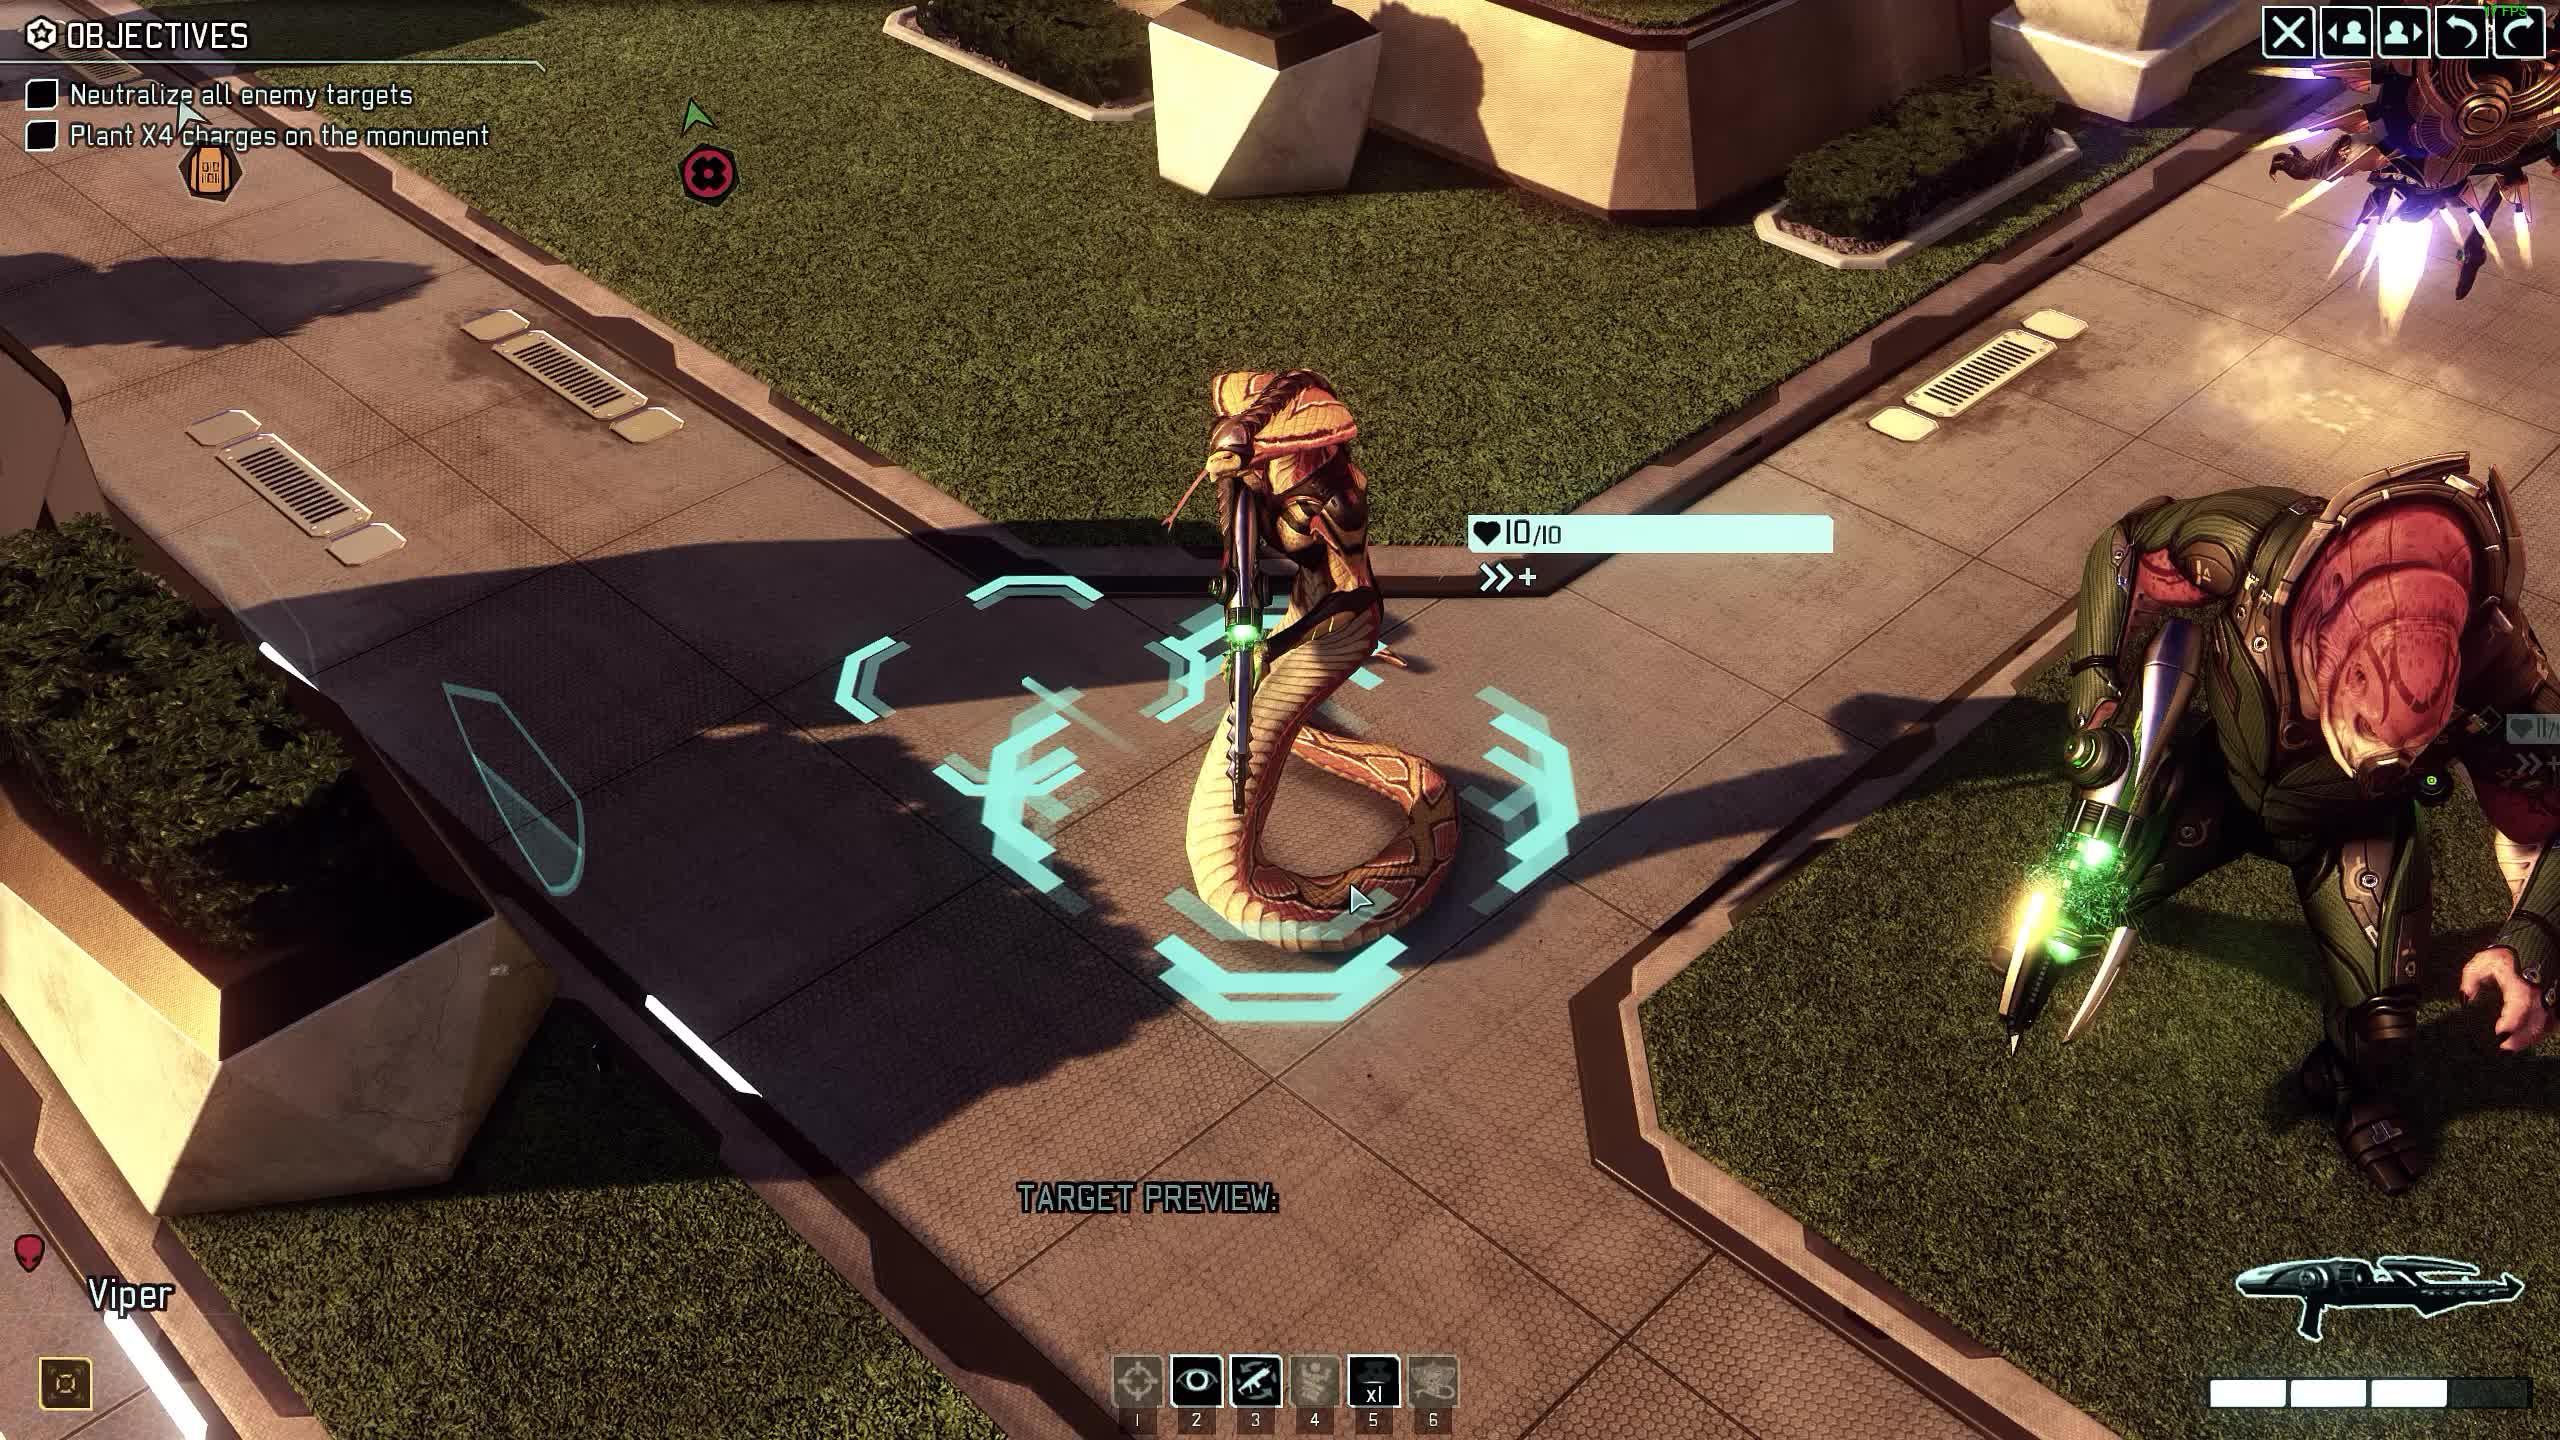 World of Warcraft, XCOM 2 2018.12.09 - 13.42.44.03 GIFs